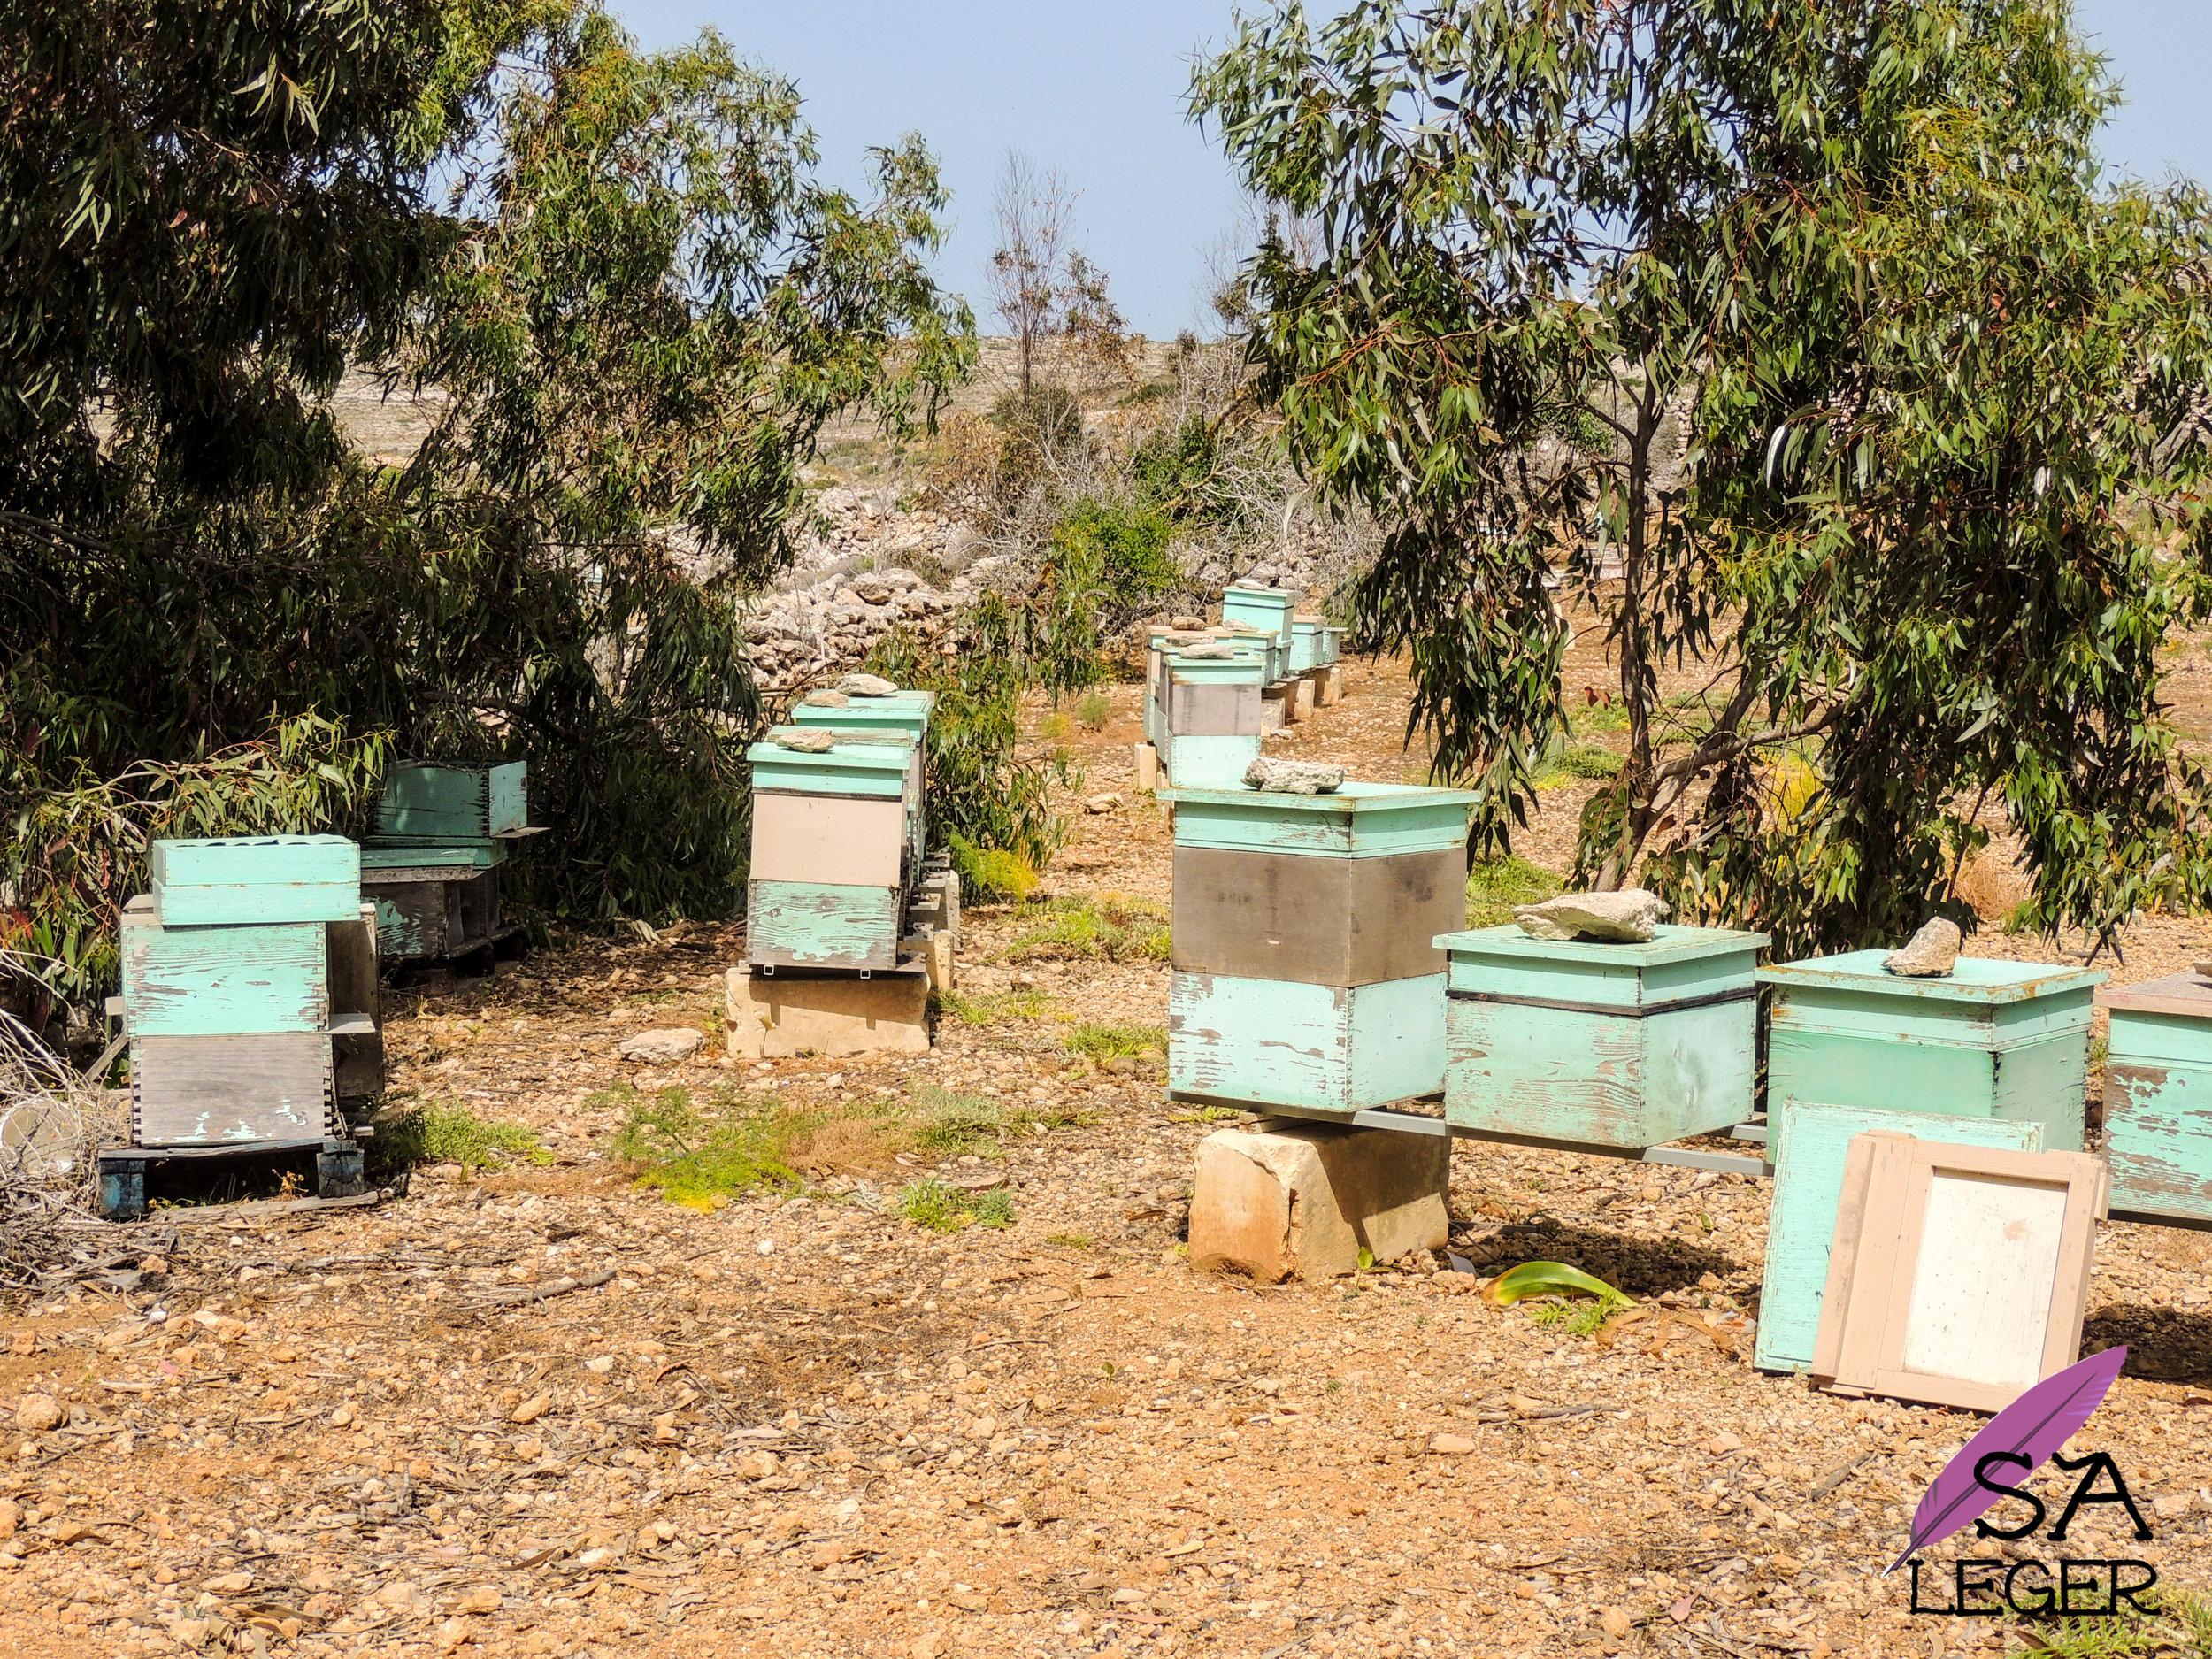 Apiary amongts olive trees - Comino, Malta